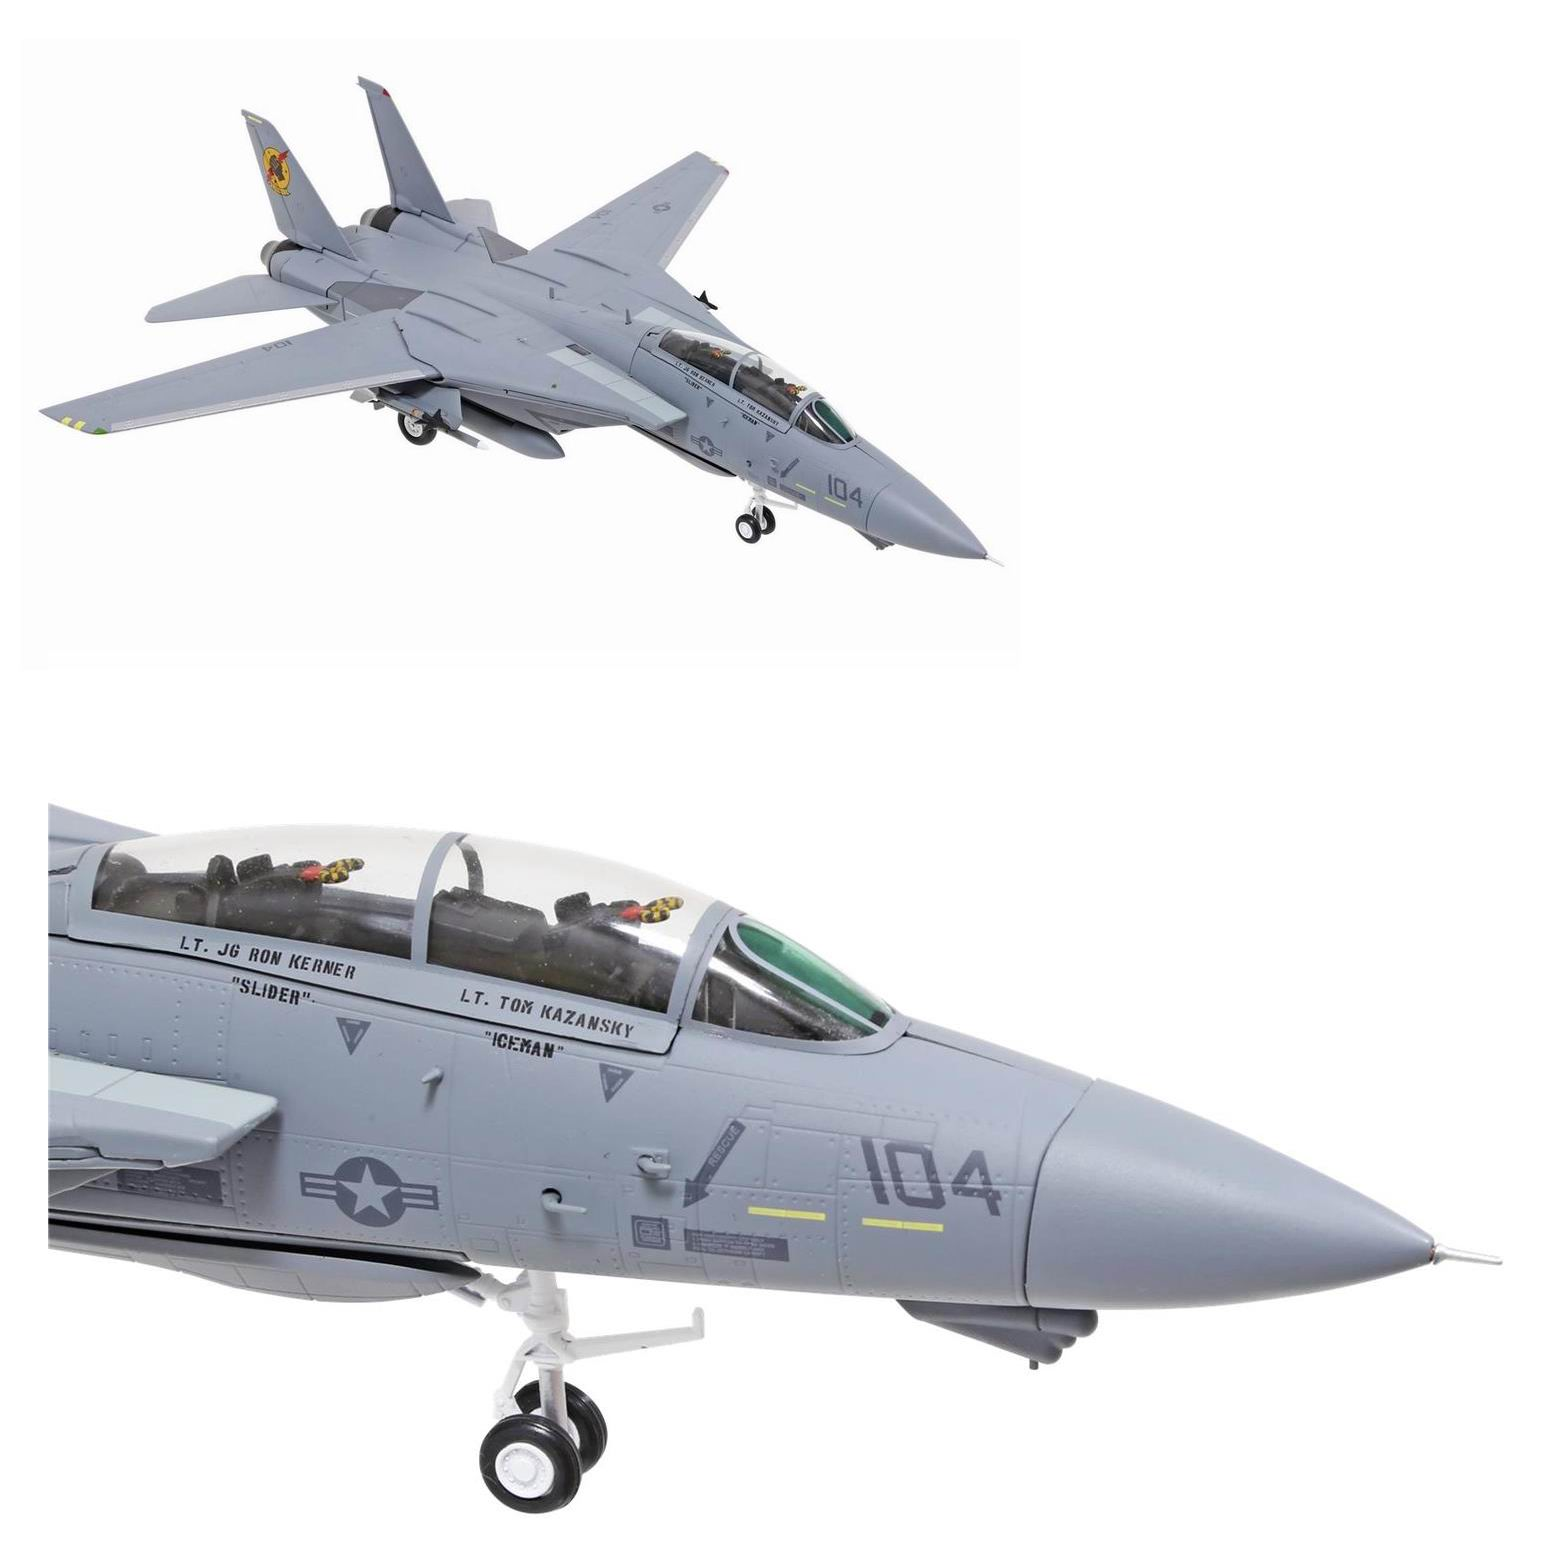 Maquette Avion de Chasse Grumman F-14A TOMCAT Film TOP GUN Iceman et Slider 1/72